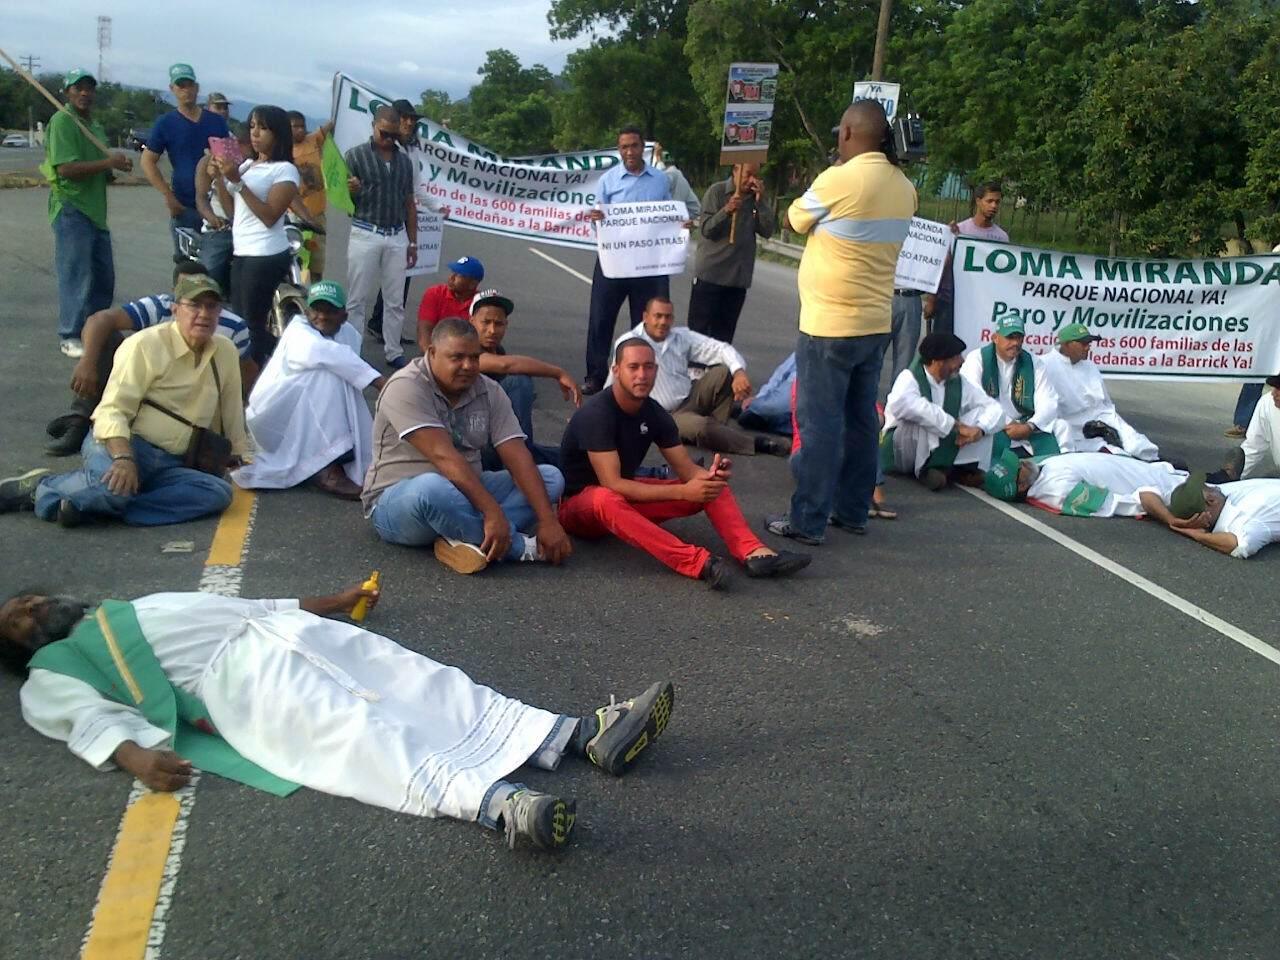 Sacerdotes tendidos paralizando el transaporte en Autopista Duarte